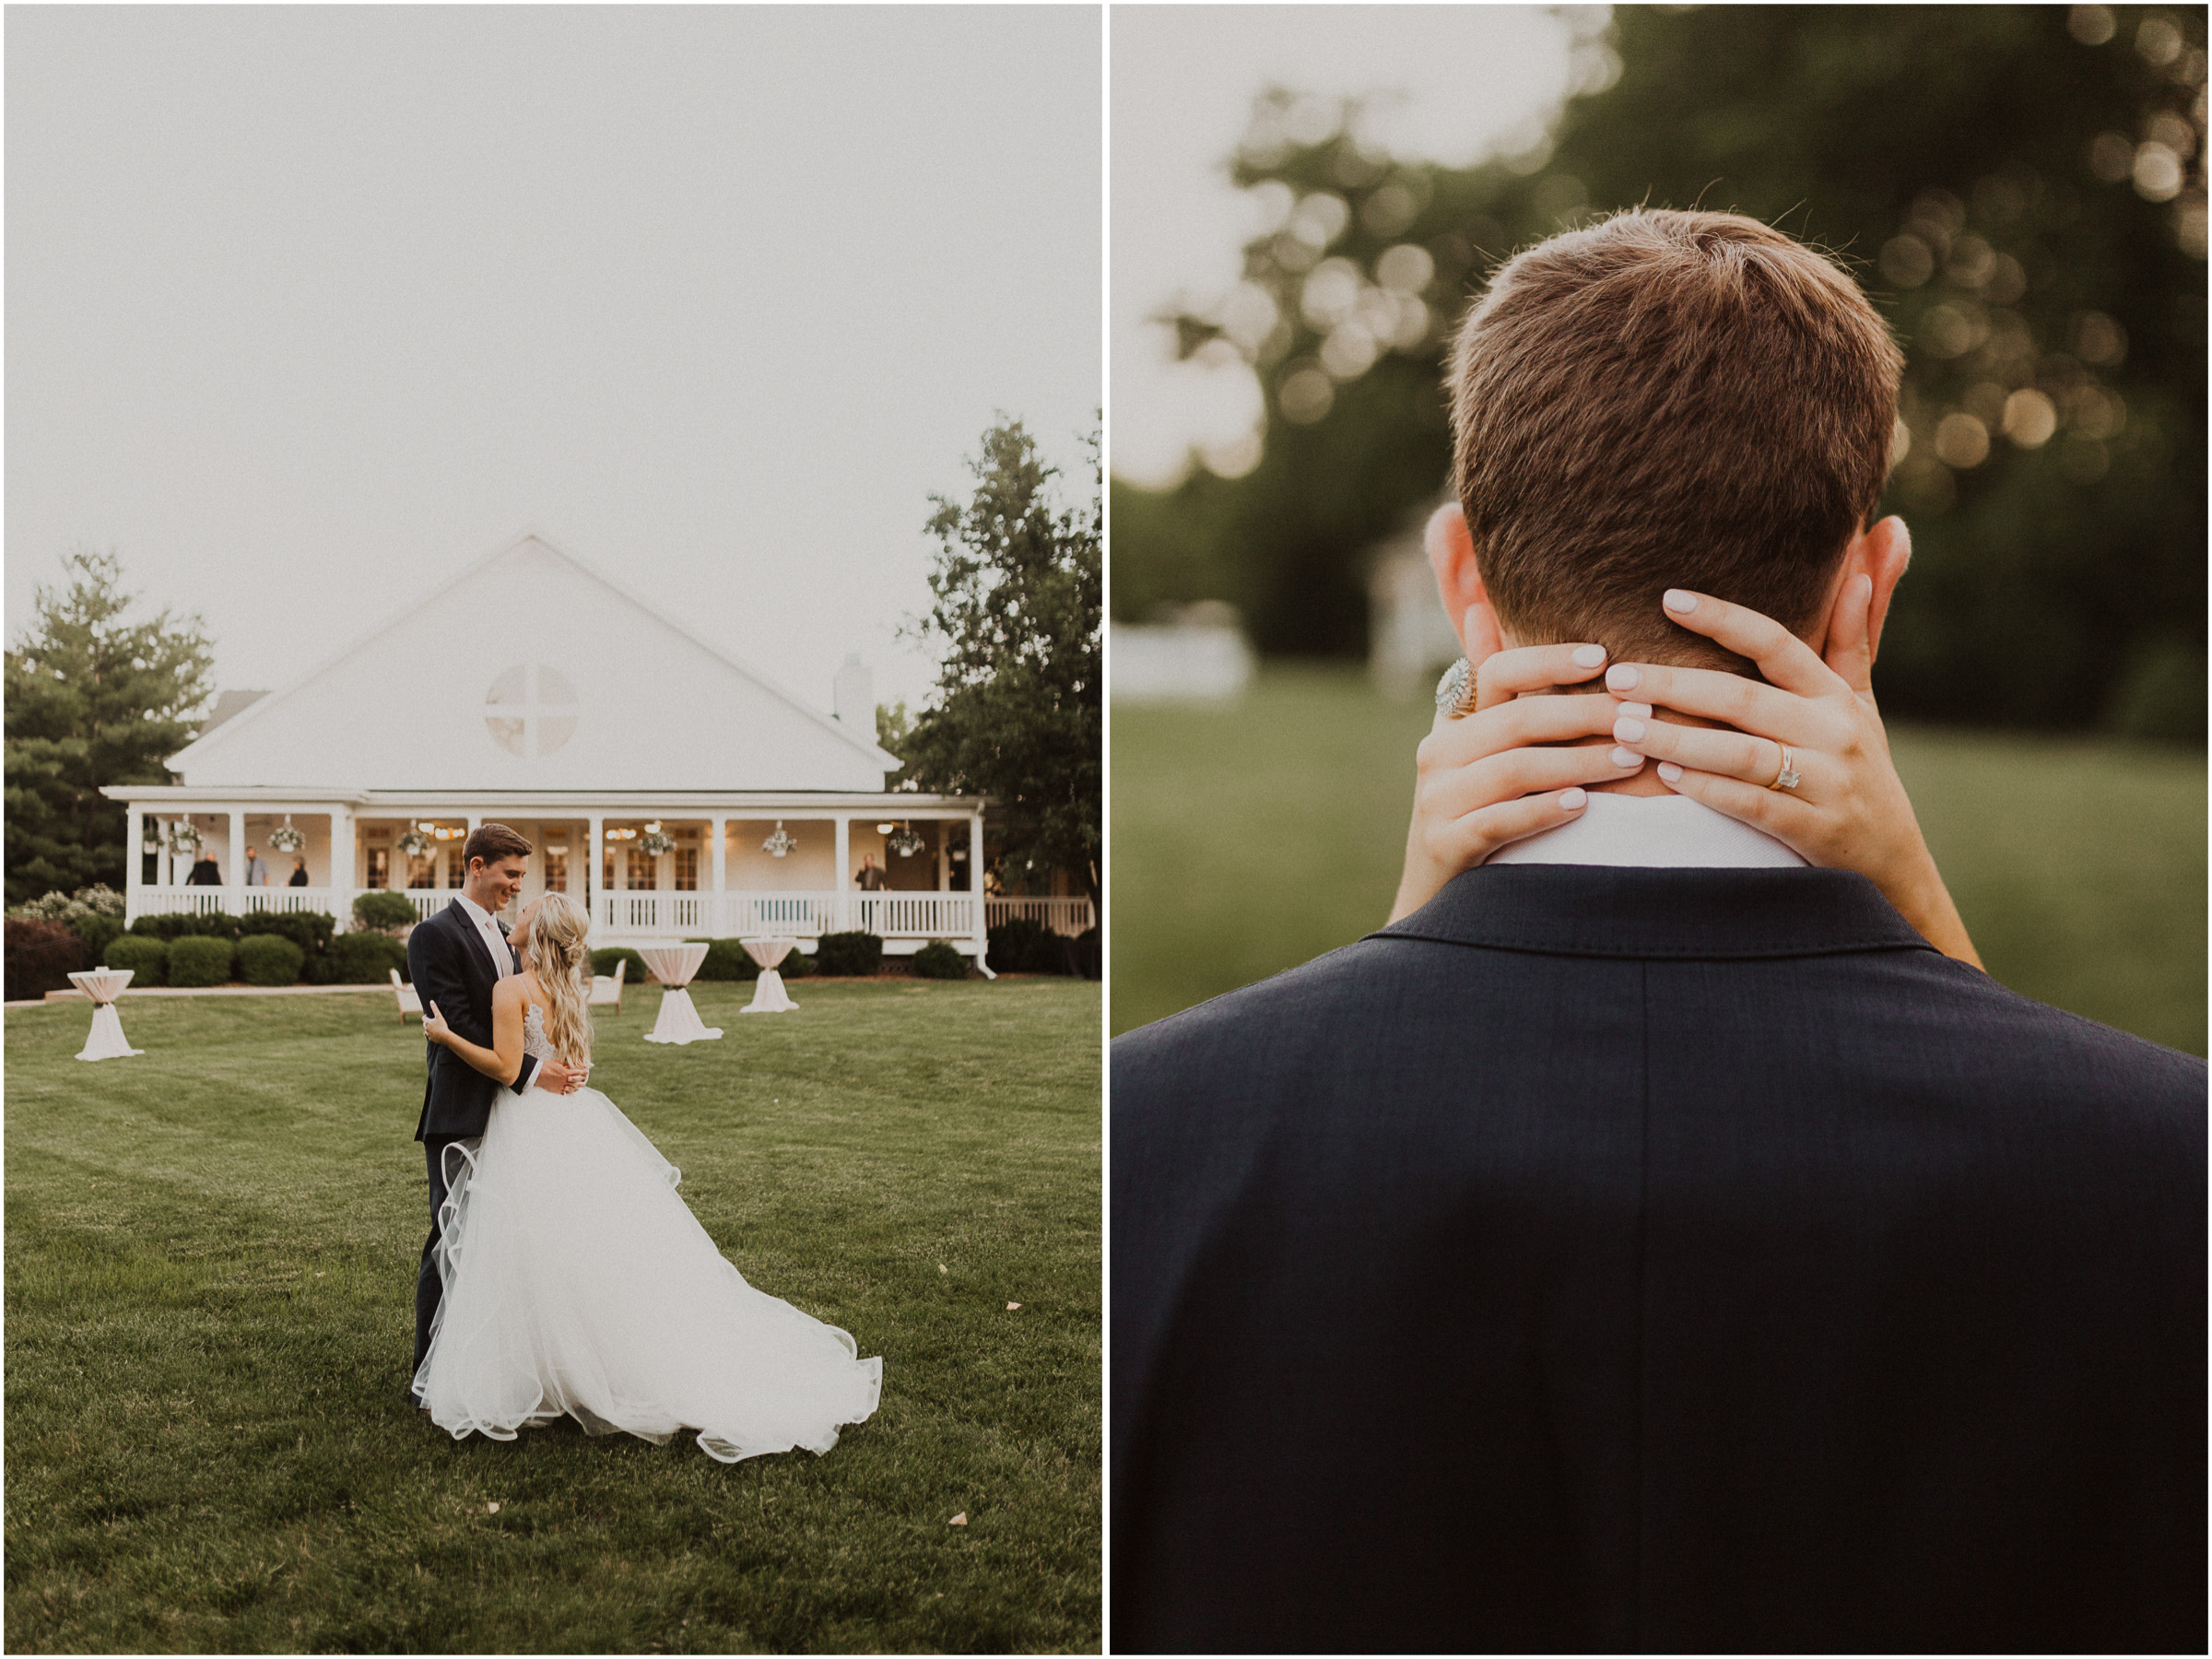 alyssa barletter photography hawthorne house summer outdoor wedding southern charm inspiration-56.jpg